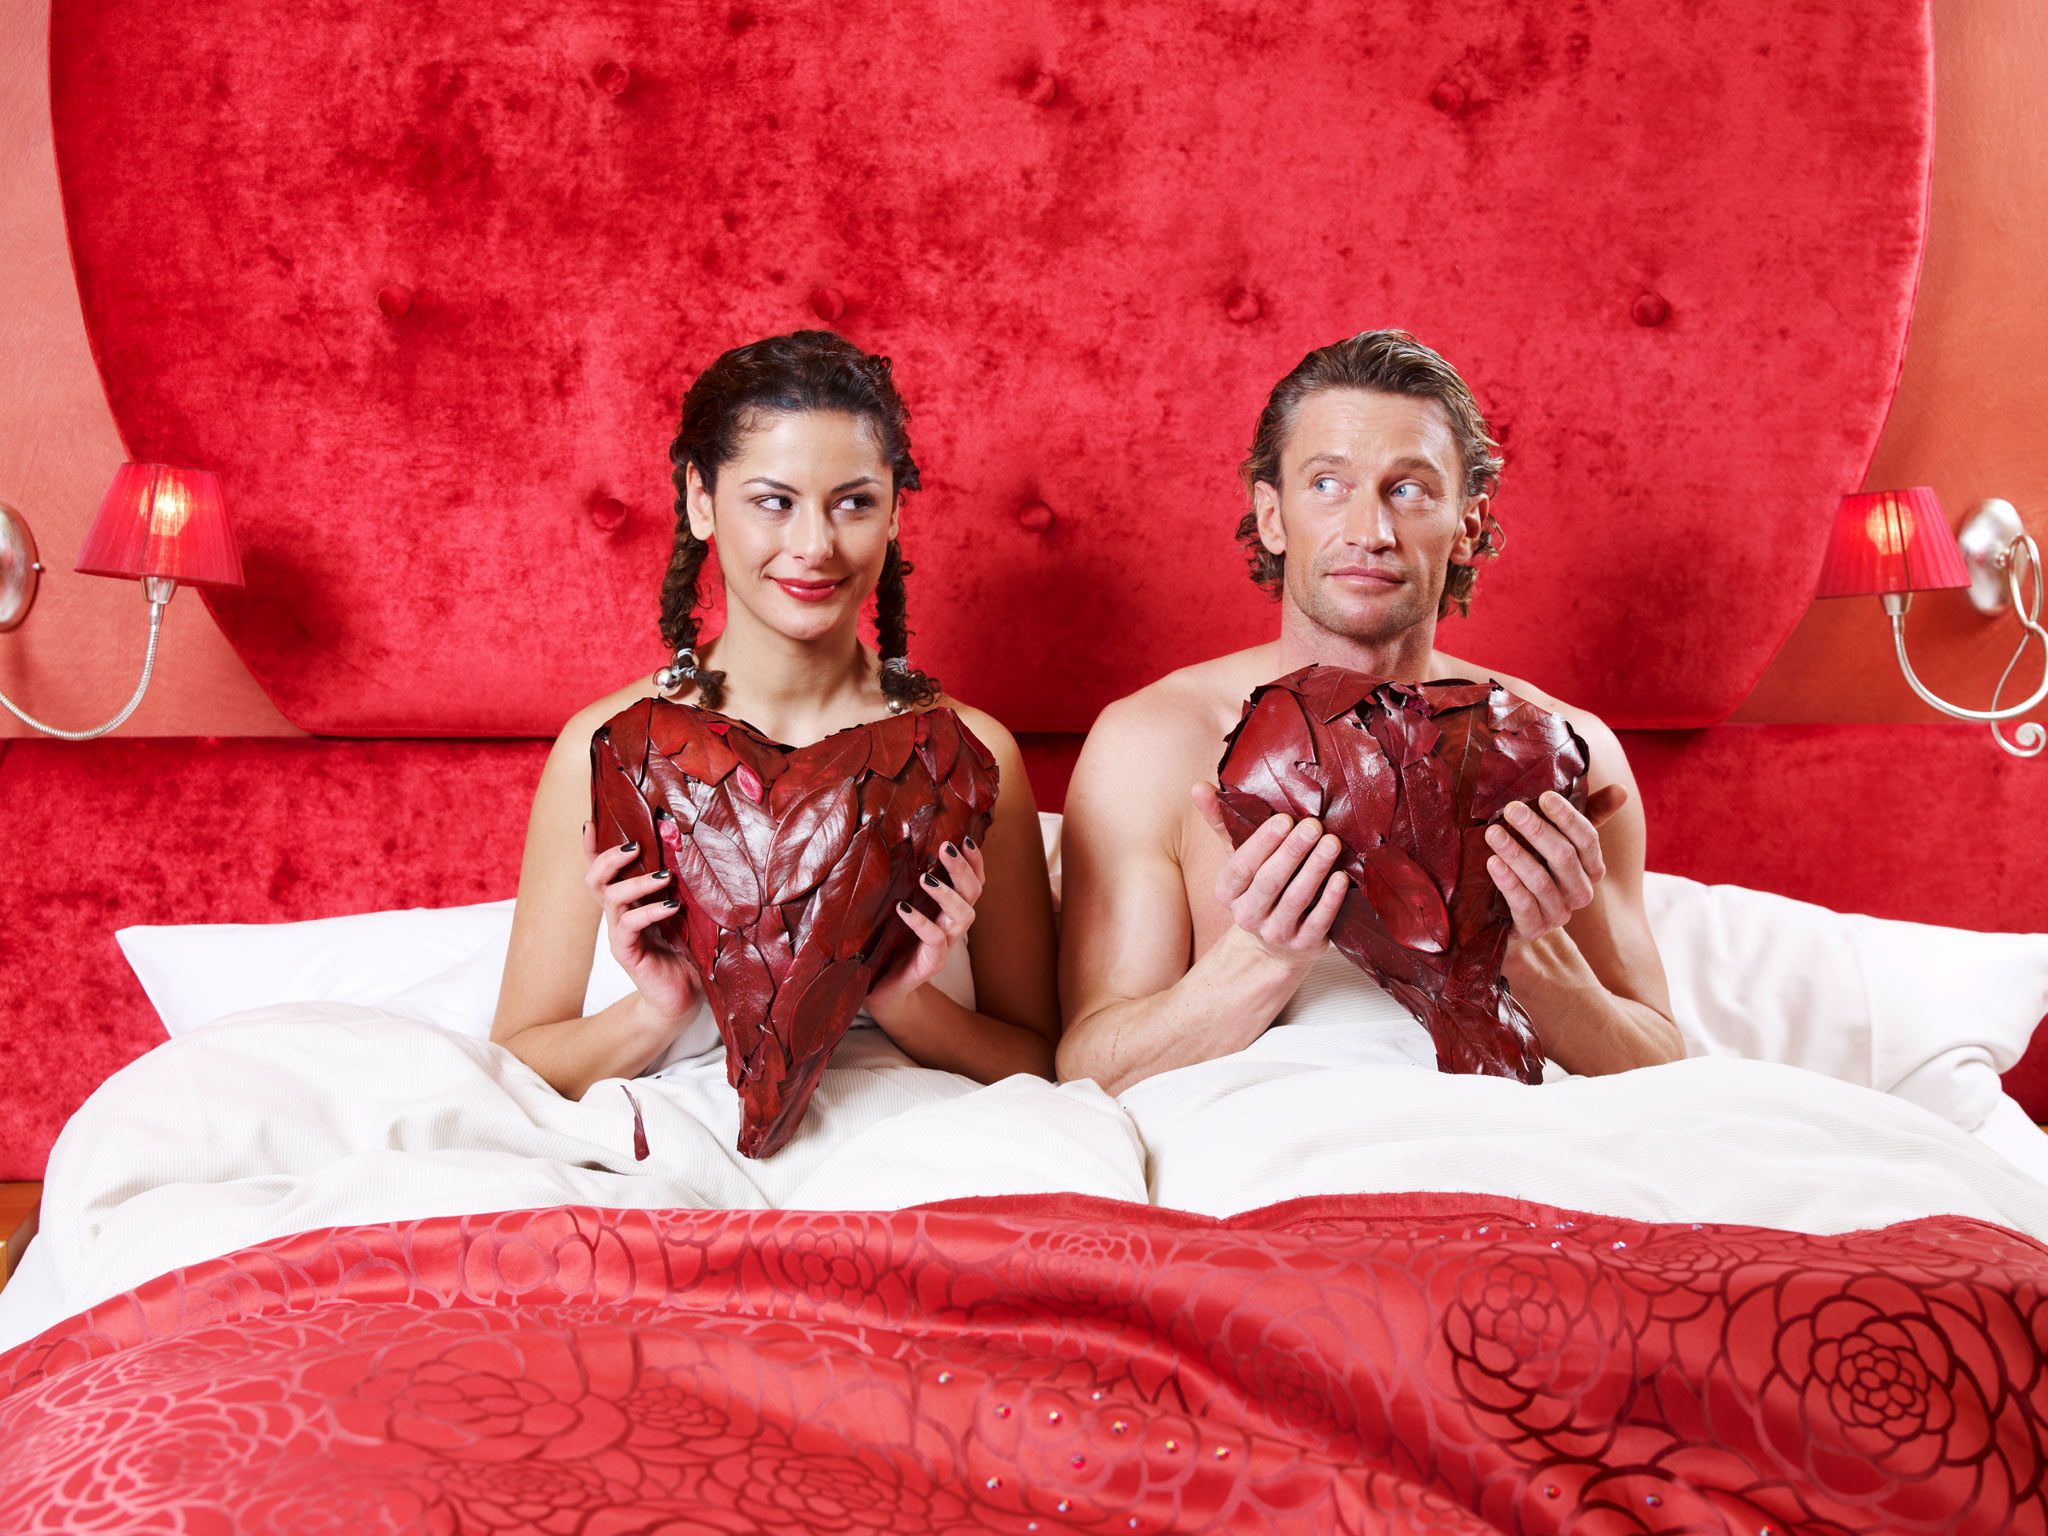 Romantisch anders. #romantik #romatikurlaub #honeymoon #hochzeitsreise #partnermassage #wellness #spa #massagen #beauty #wellnesshotel #wellnessurlaub #zillertal #bergland #überraschung